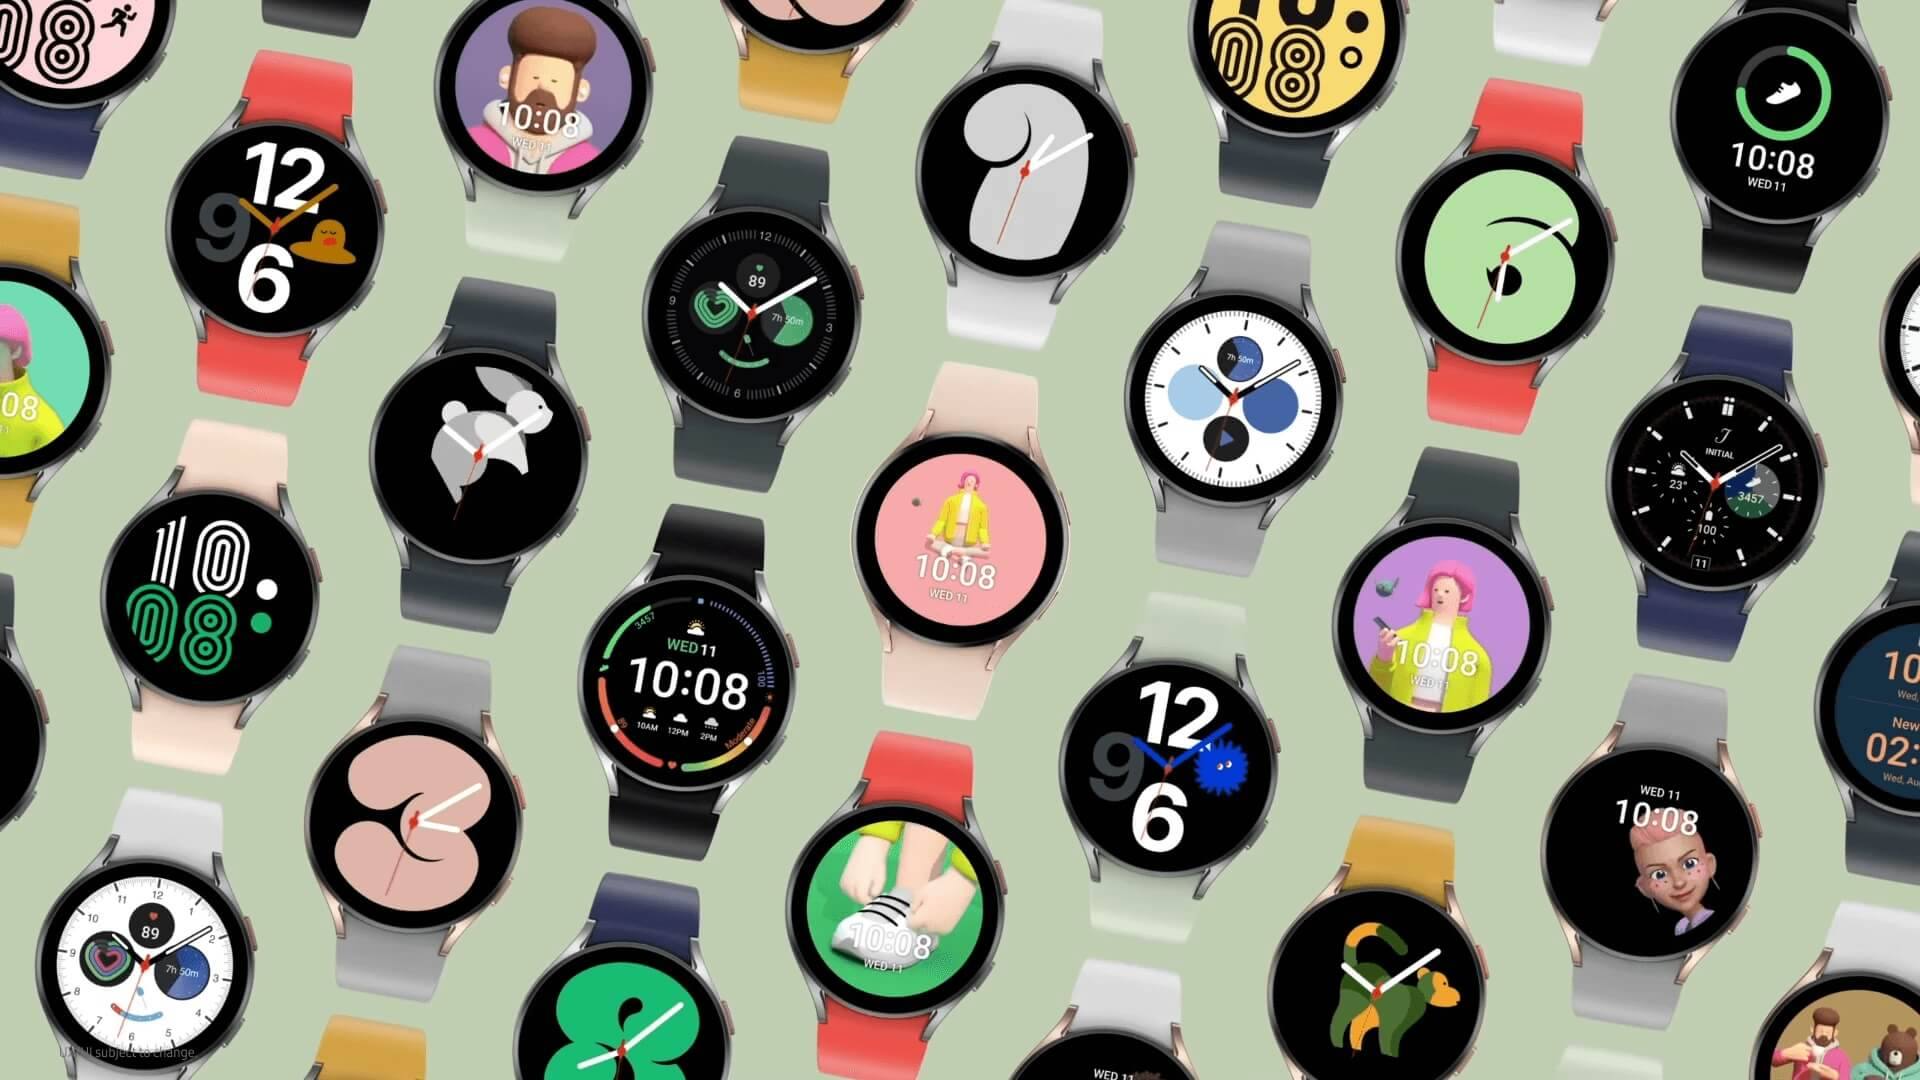 Cadrans de montre Samsung Galaxy Watch 4